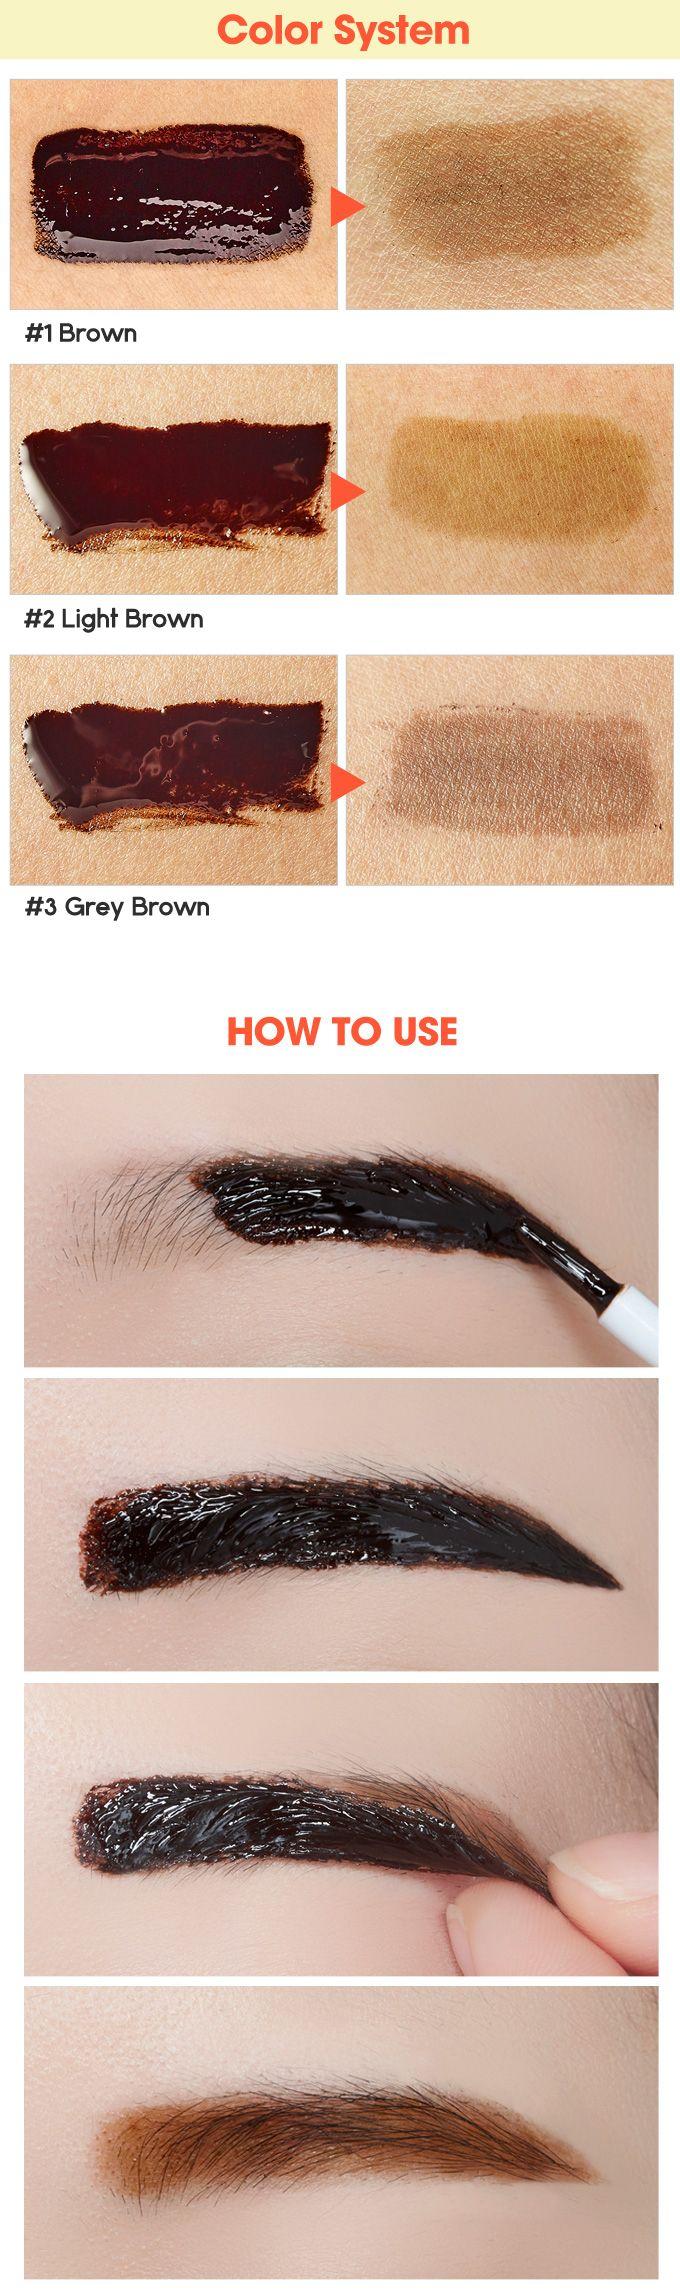 Best 25+ Eyebrow makeup products ideas on Pinterest | Cheap makeup ...